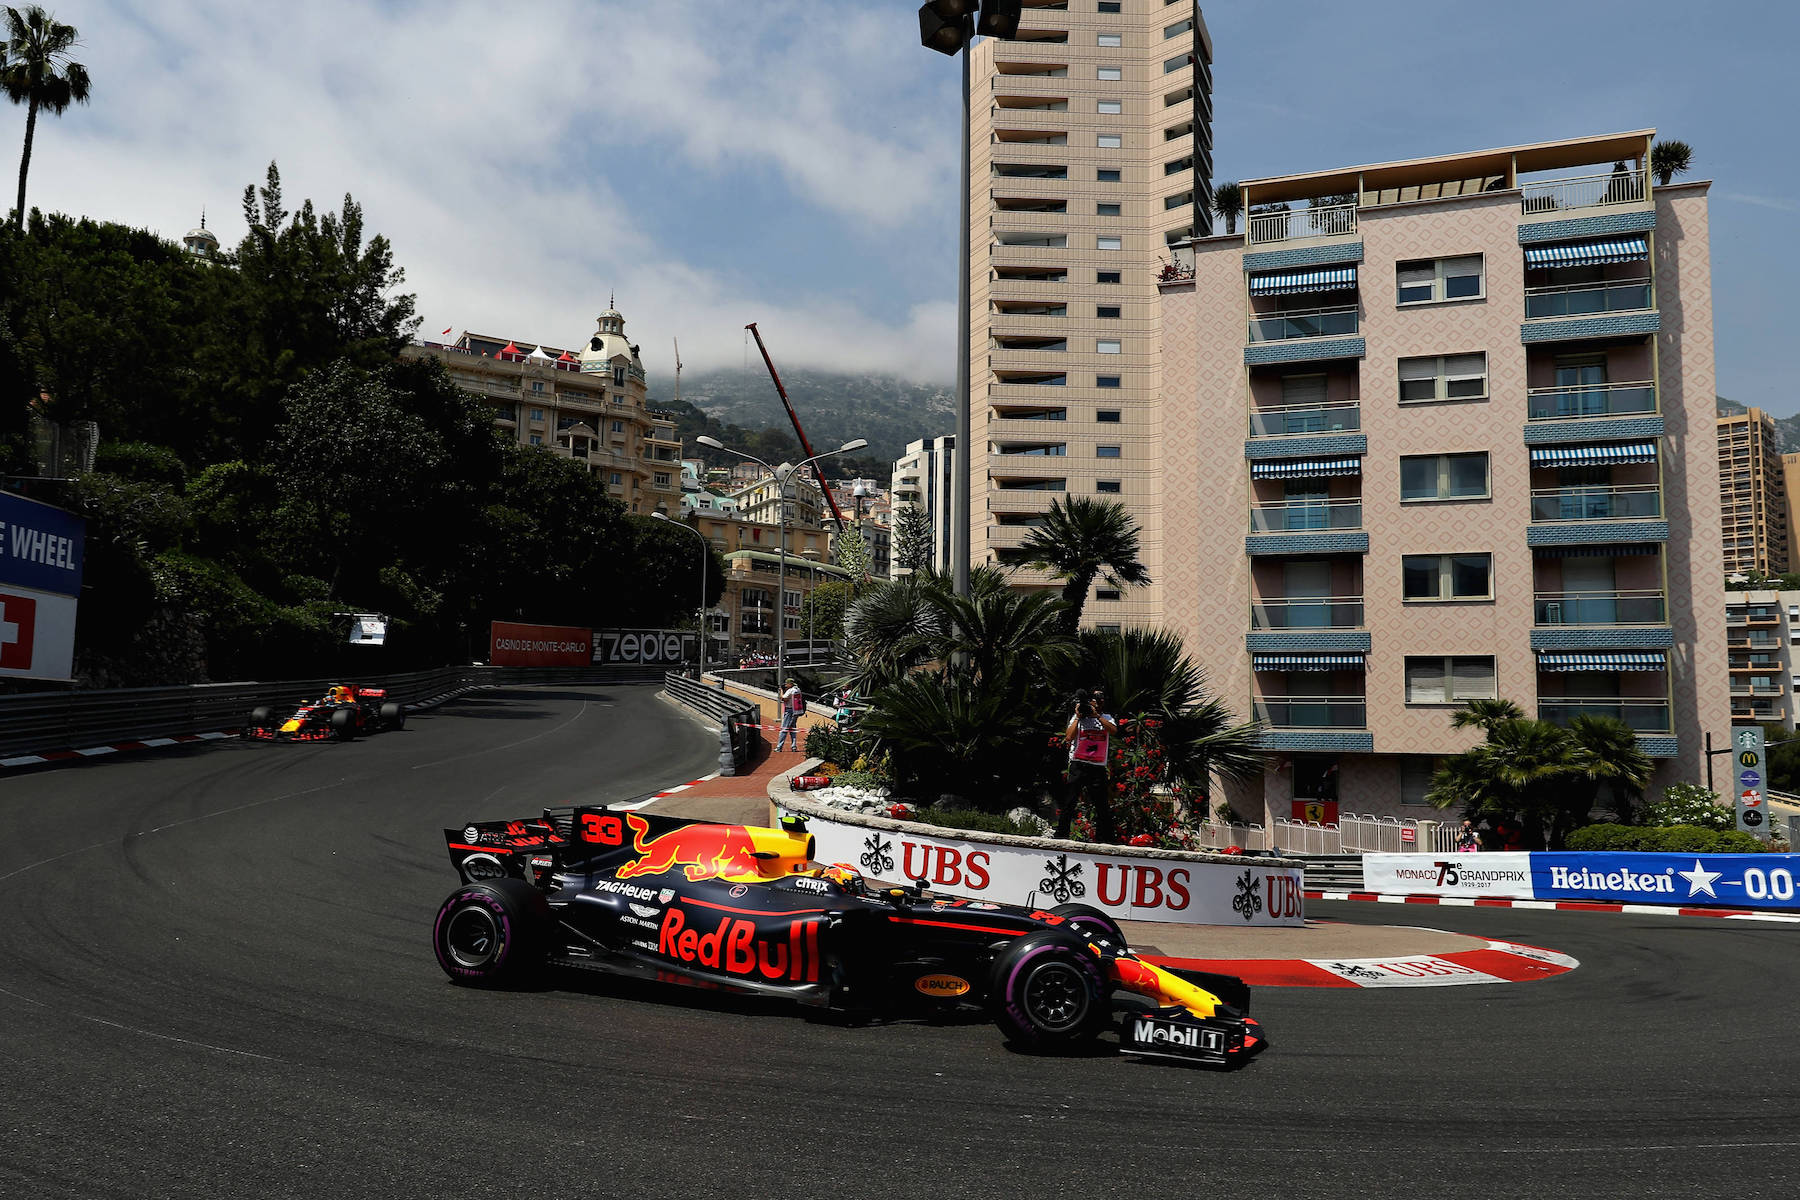 2017 Max Verstappen | Red Bull RB13 | 2017 Monaco GP 1 copy.jpg